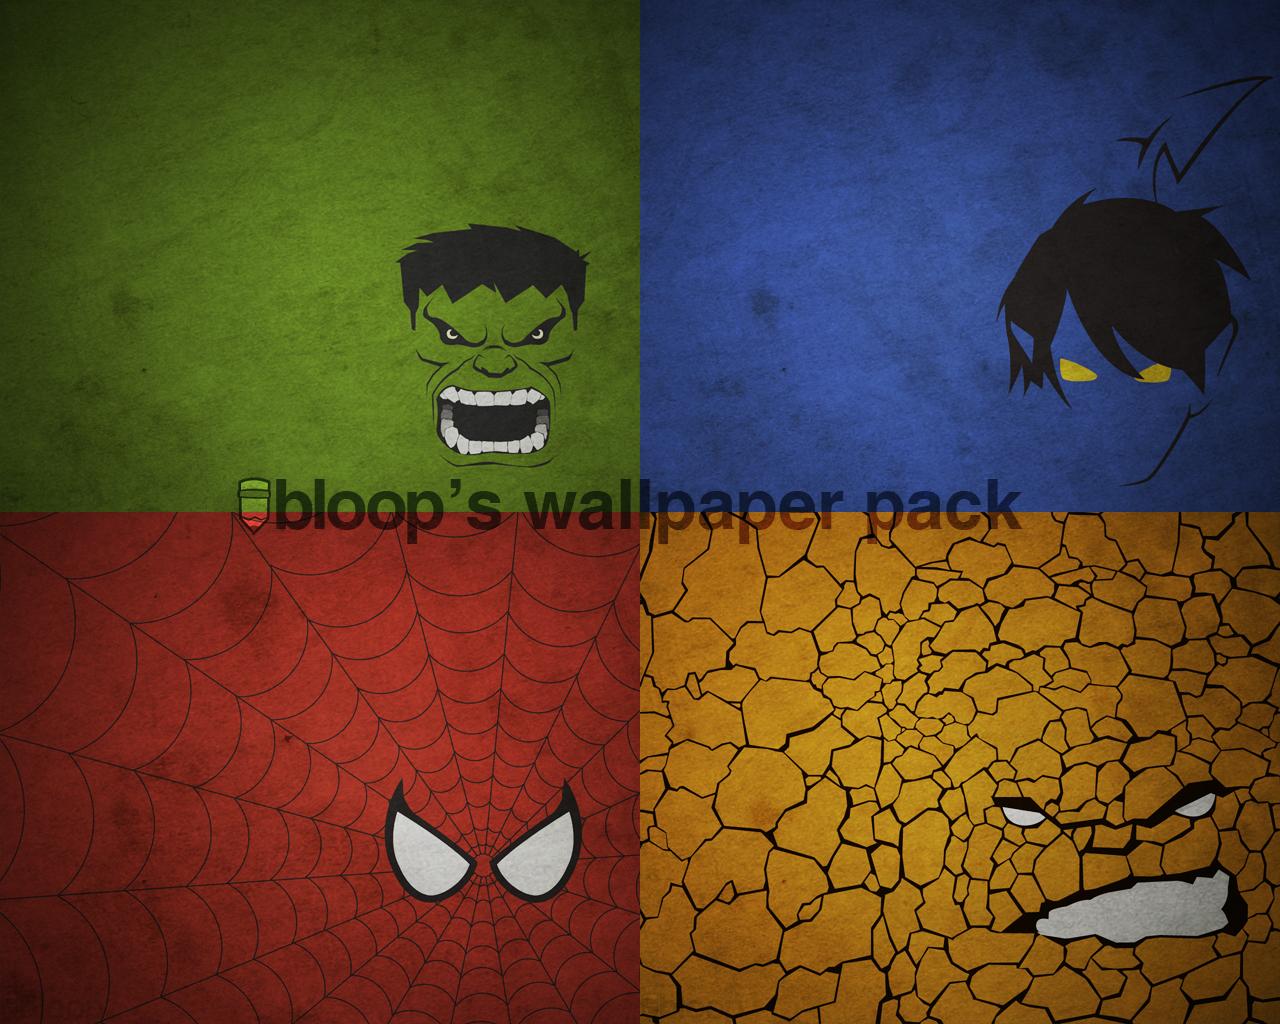 Bloops Superhero Wallpaper by blo0p 1280x1024